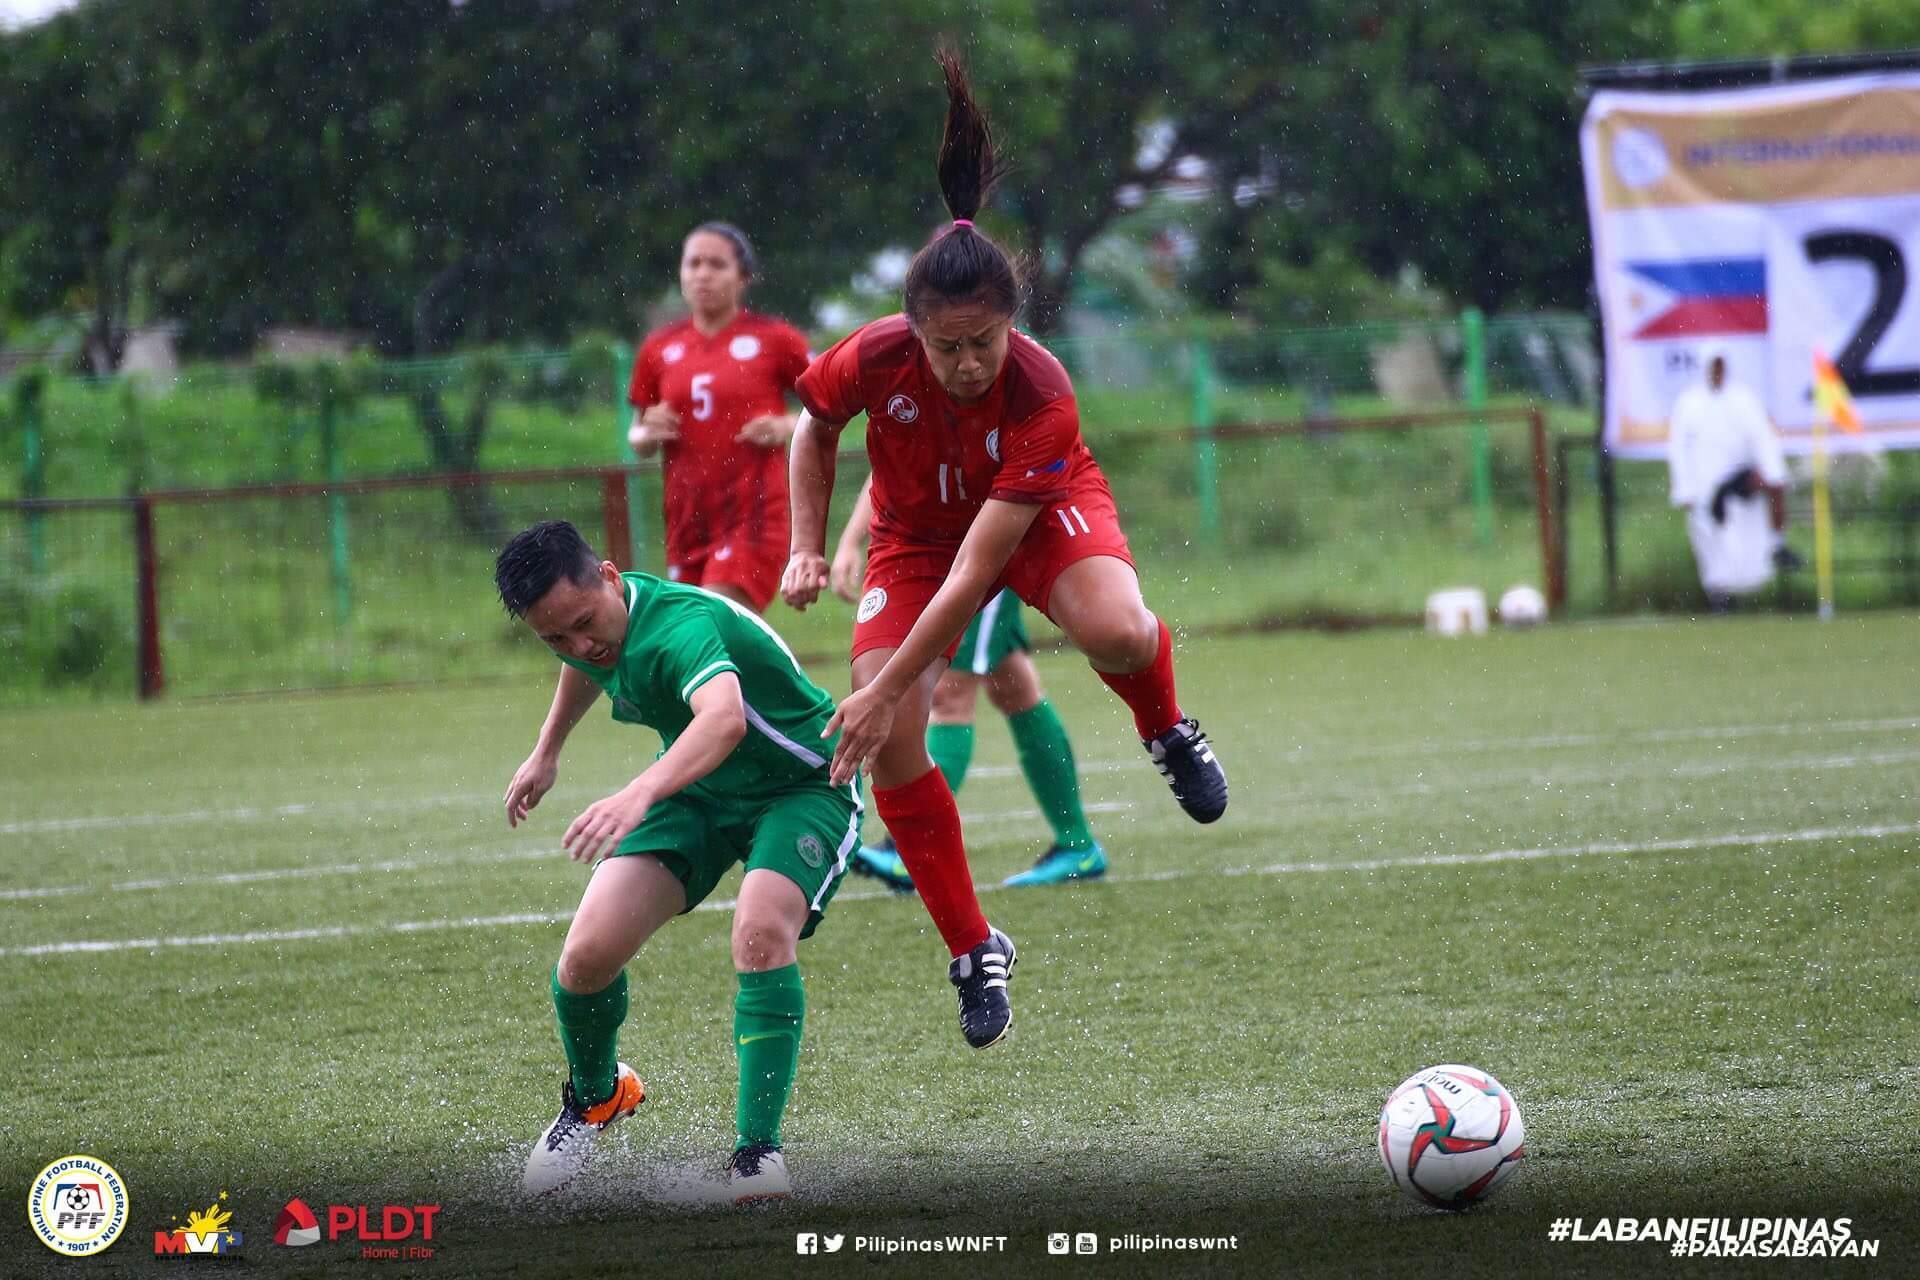 Philippine Women's football